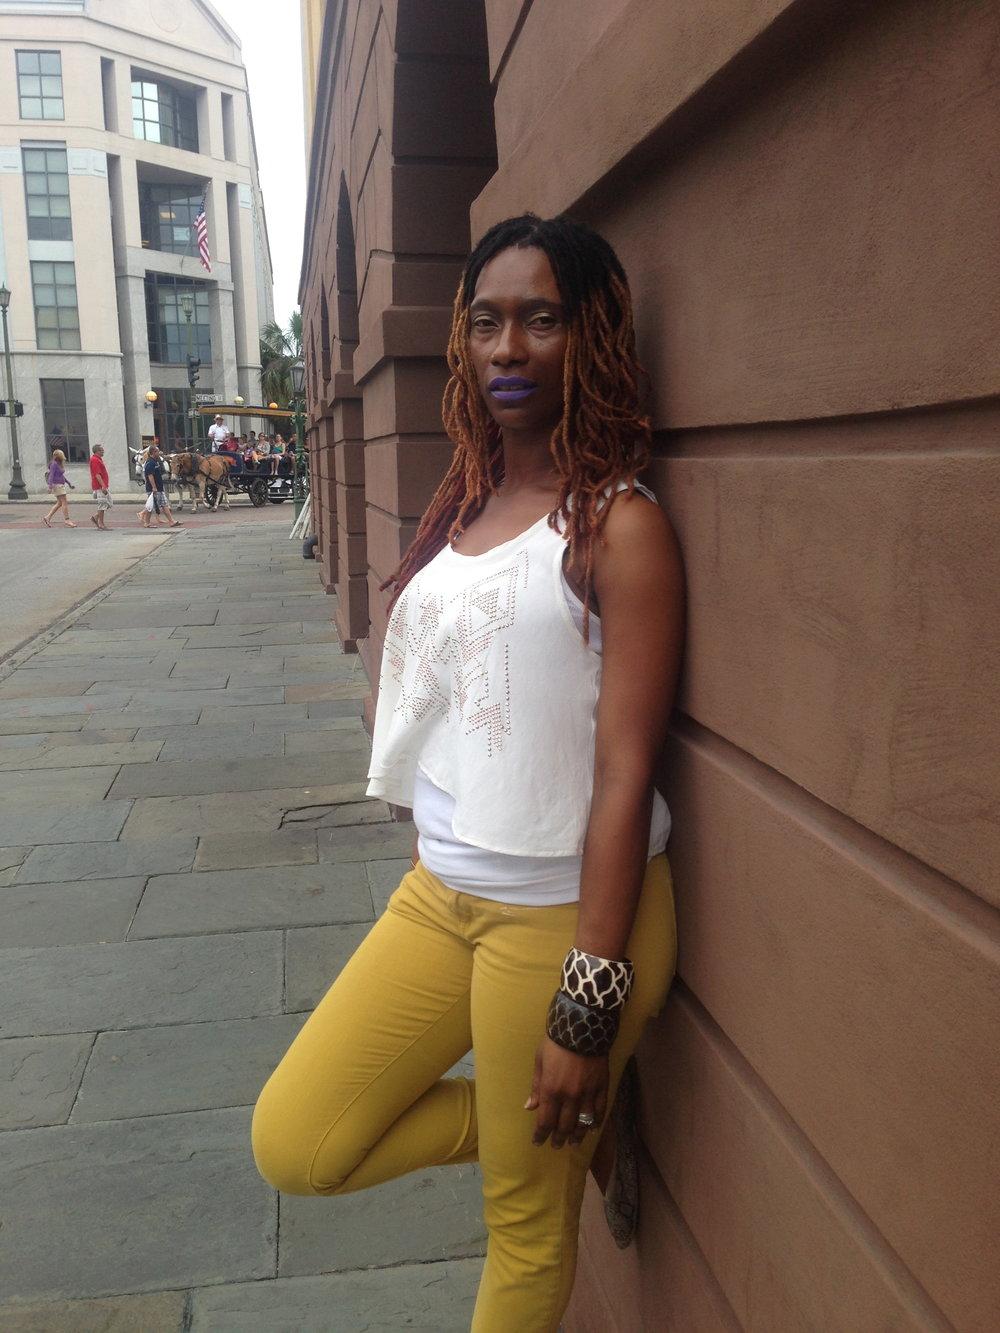 Sheinata Carn-Hall Owner/African Art Jewelry & Clothes Designer @reflectionsafricanjewelryllc